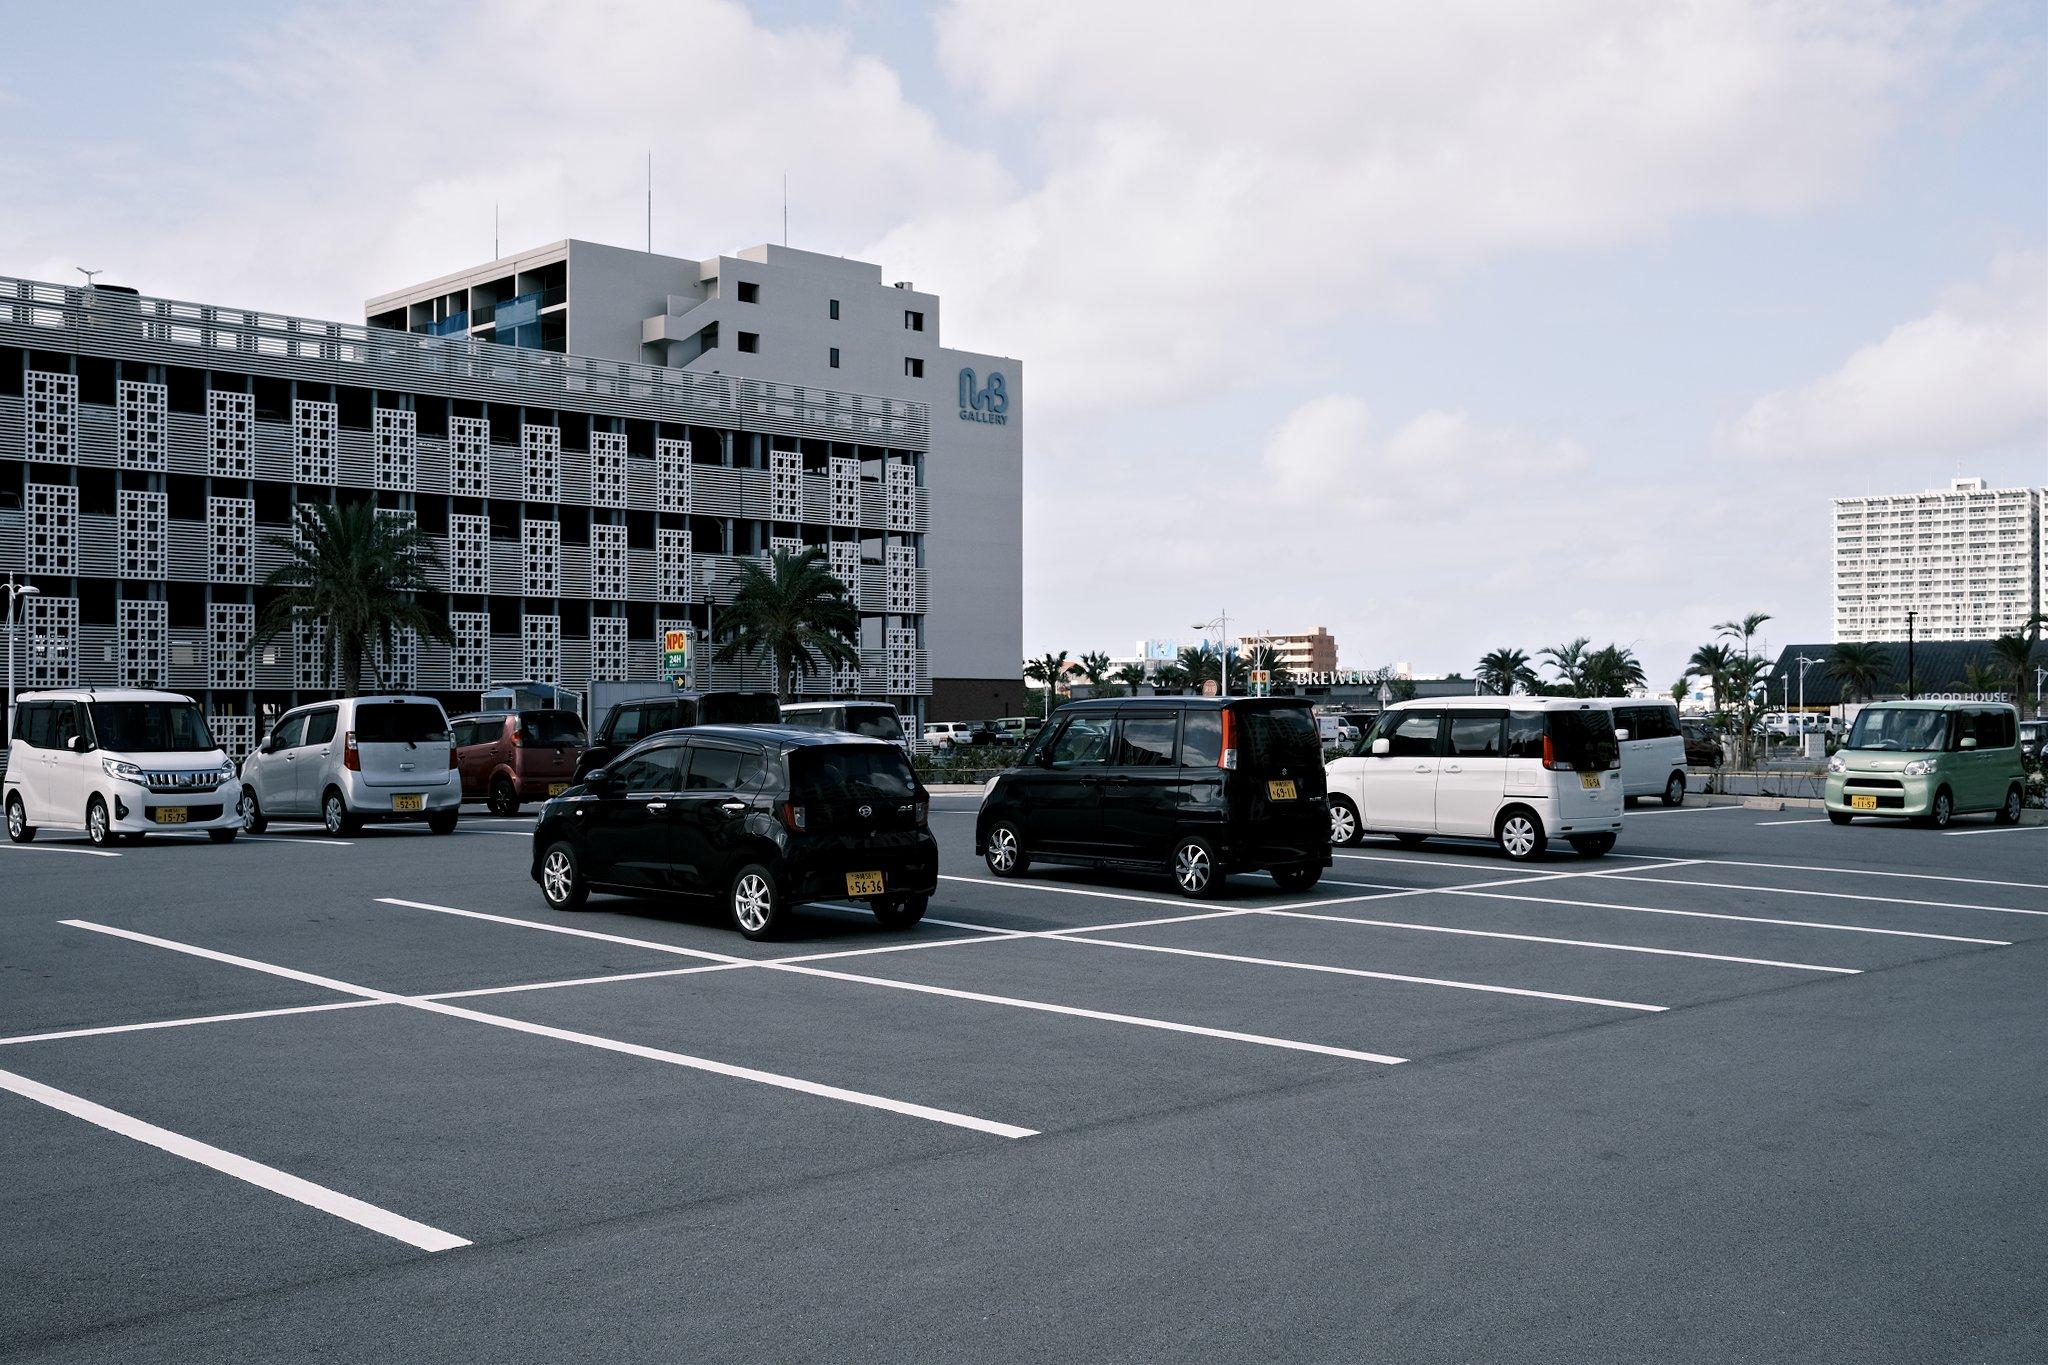 OKINAWA-202011-00131